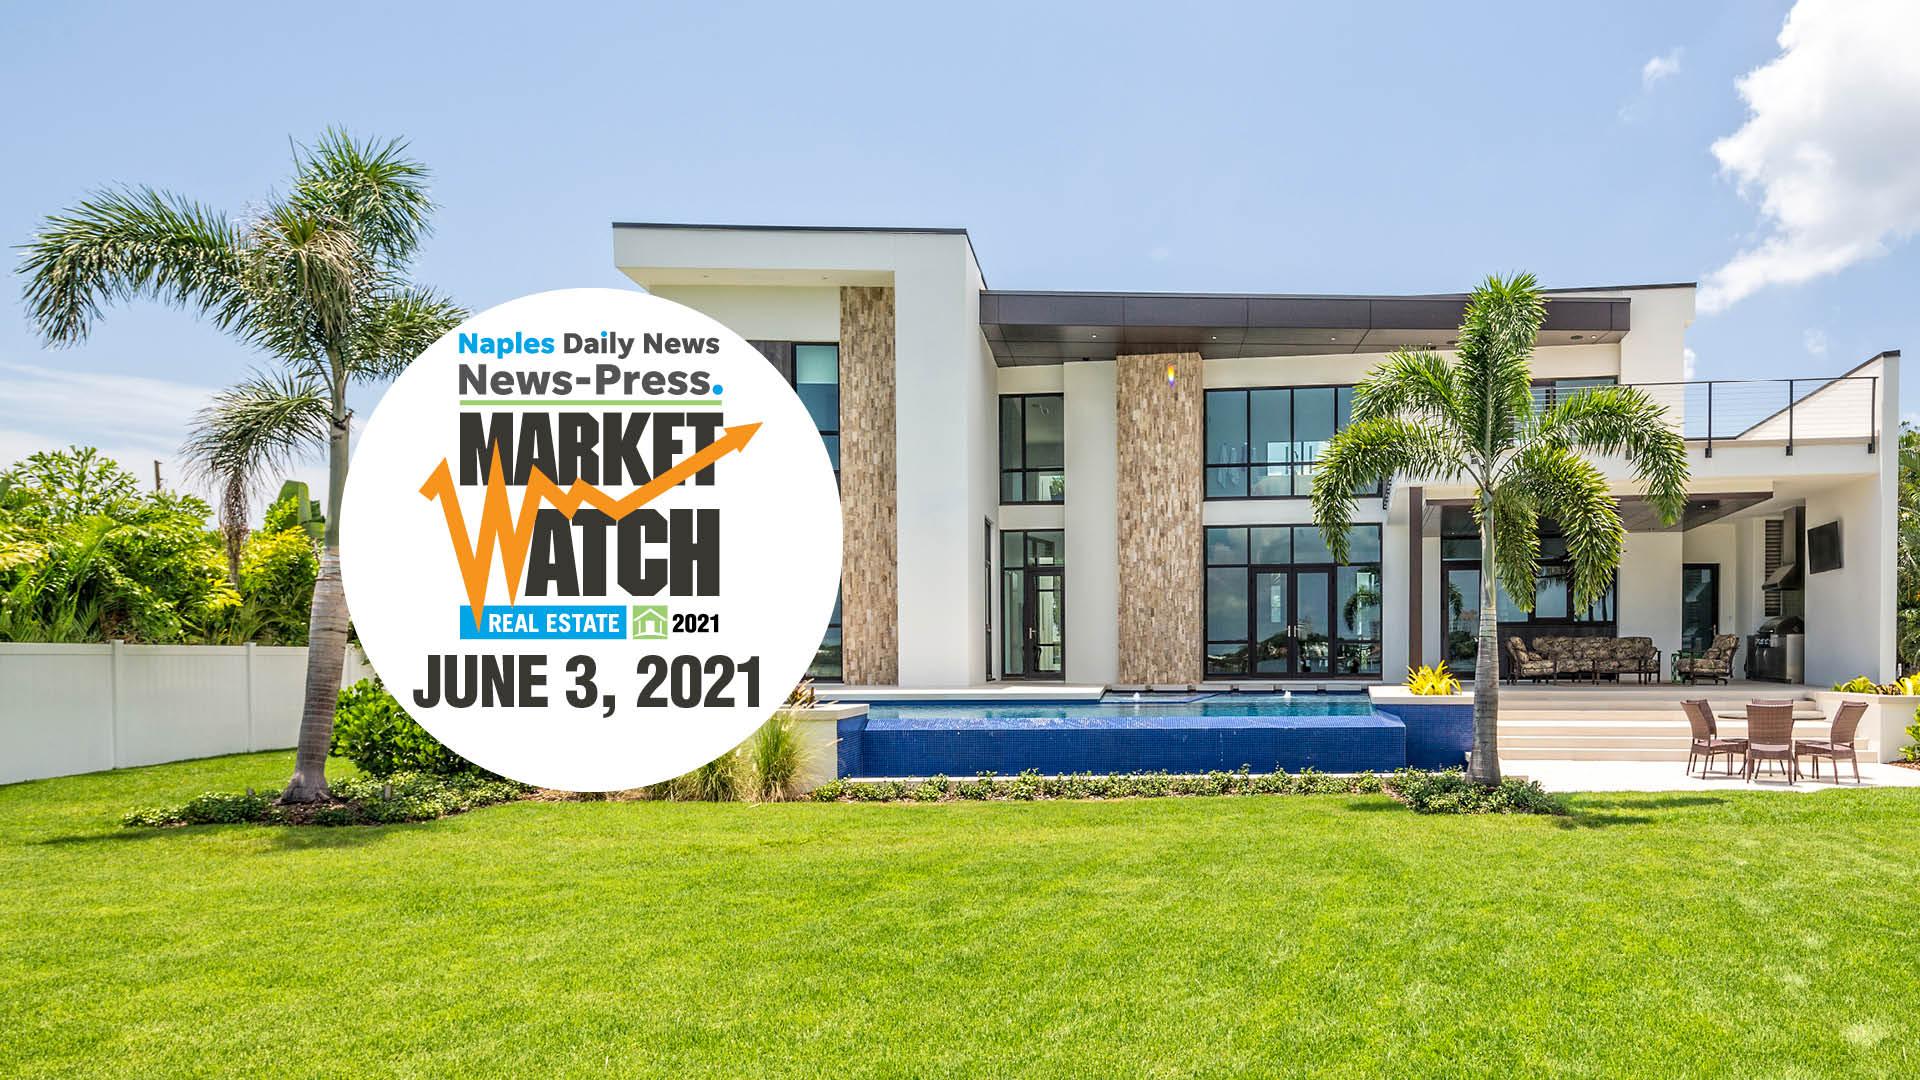 Market Watch draws big crowd amid real estate boom 3